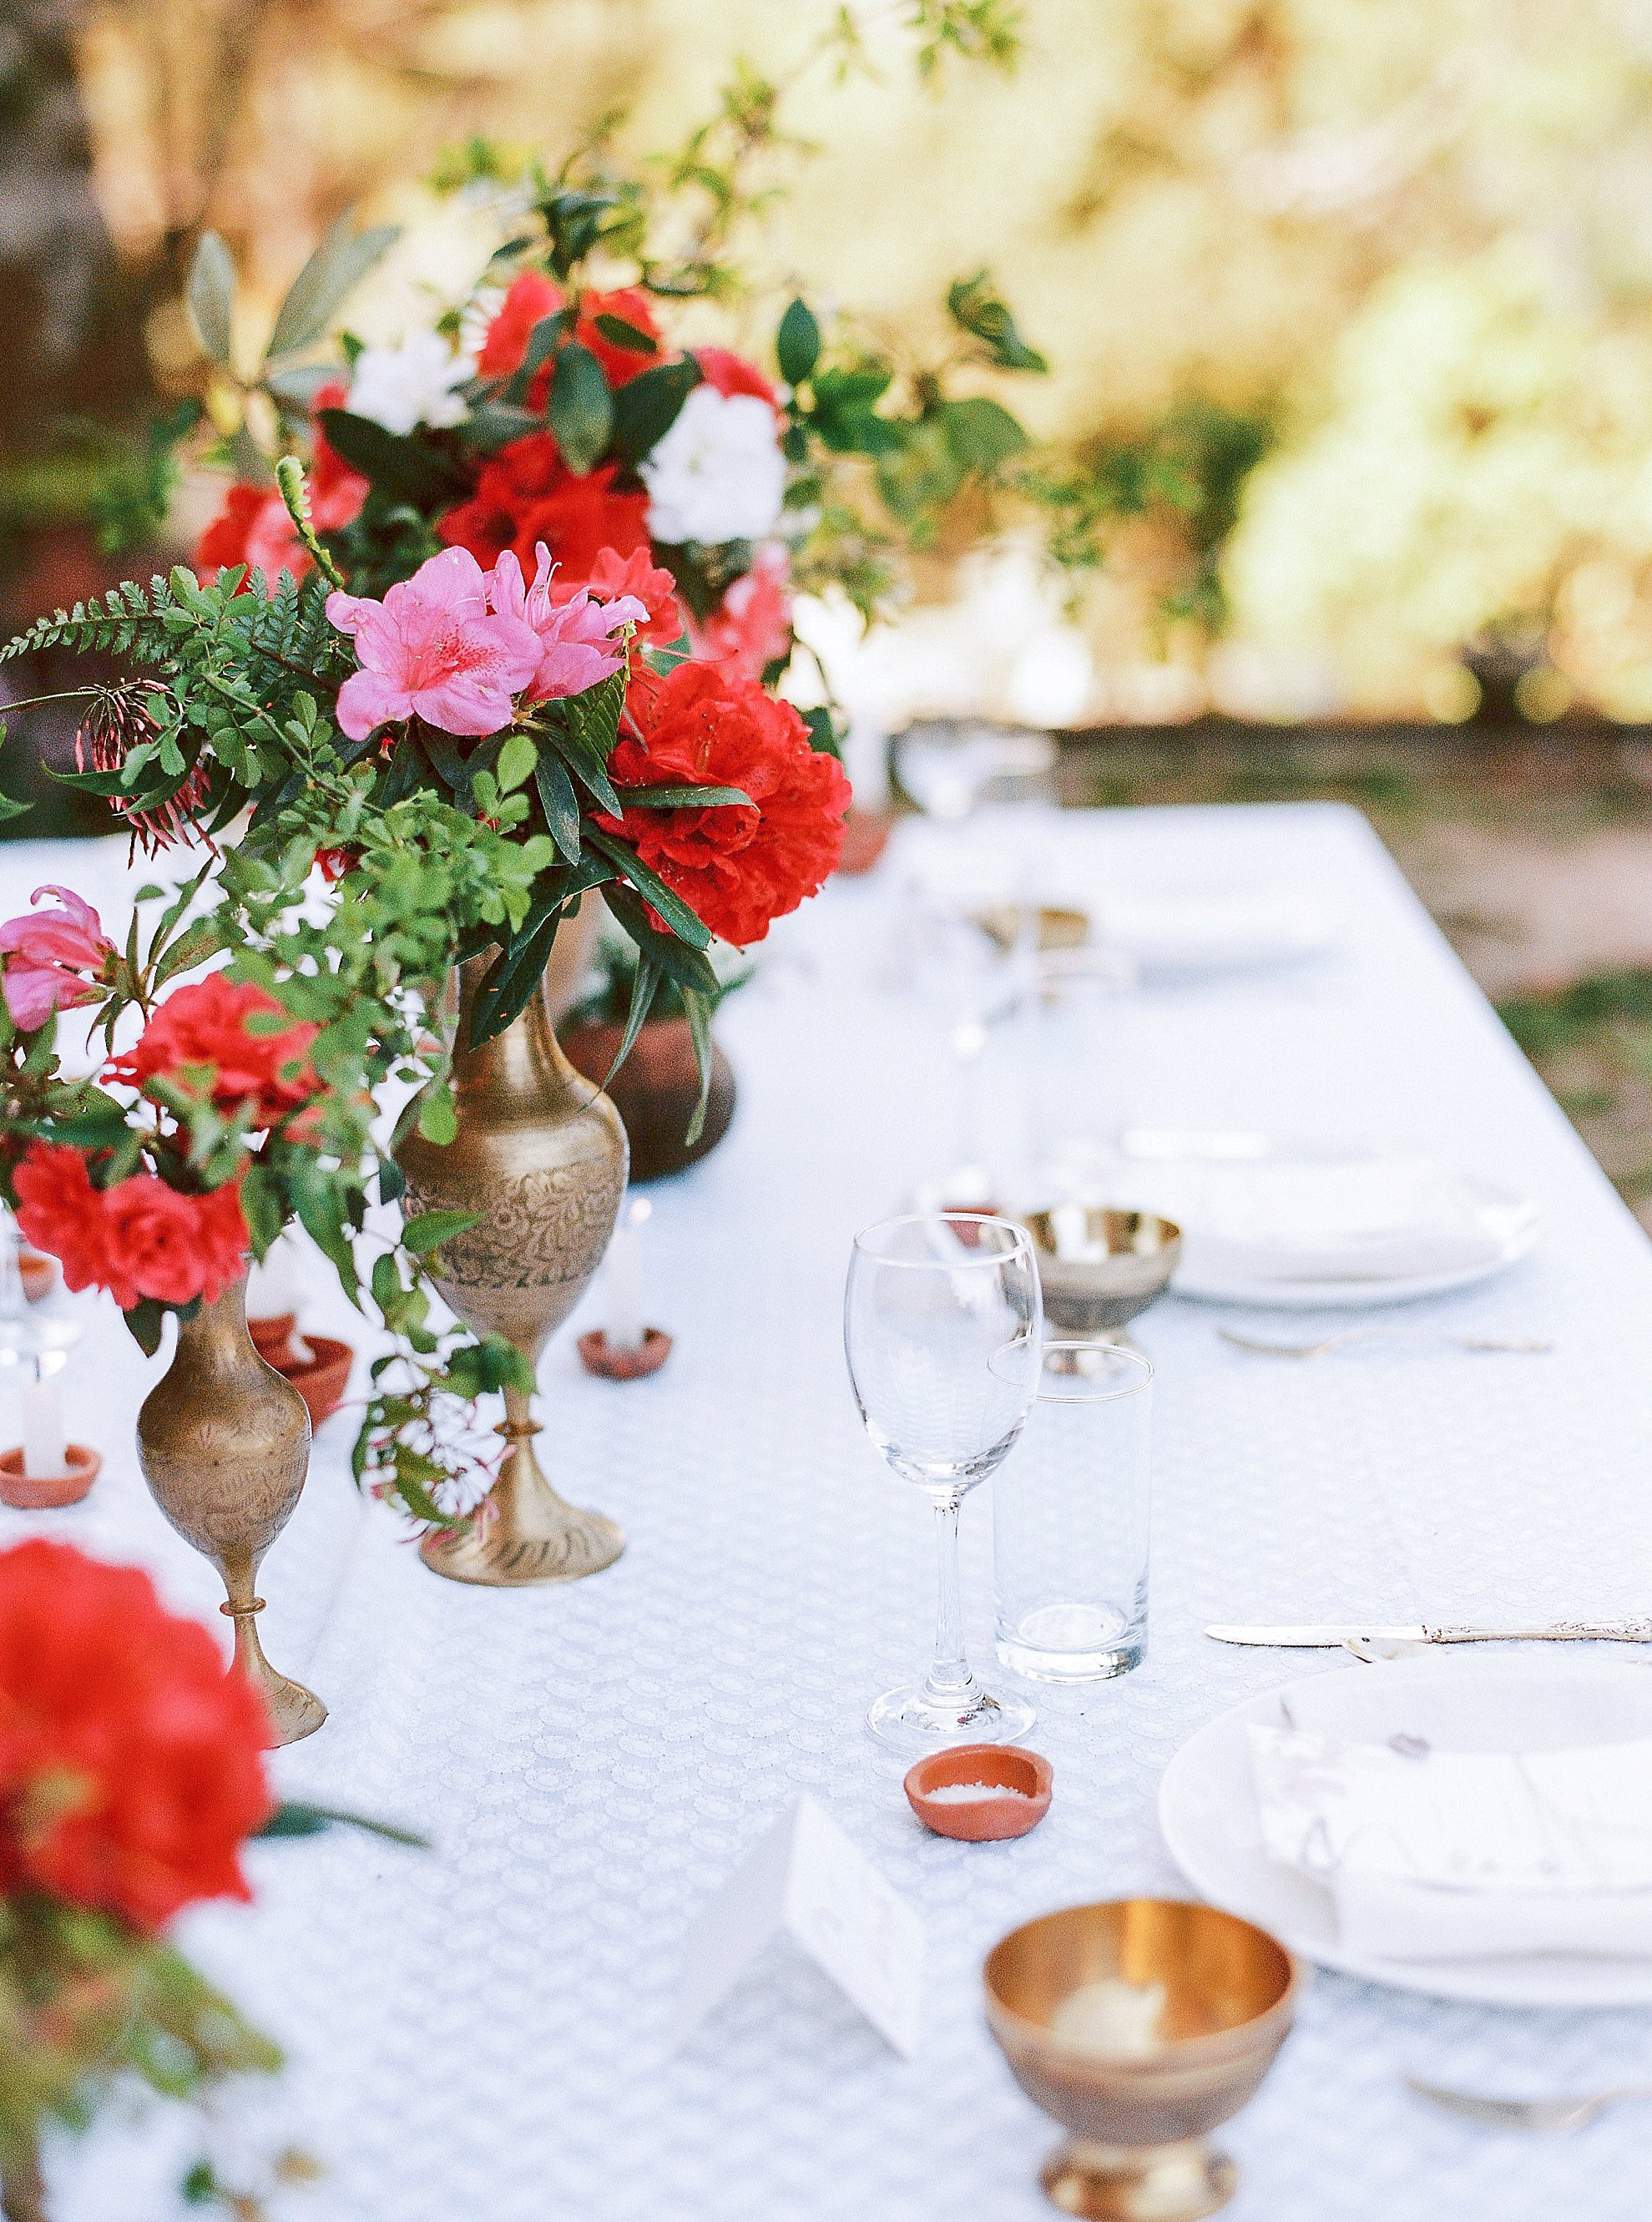 Bianca-Rijkenbarg-fotografie-for-this-romance-bruidsinspiratie-blog_0009